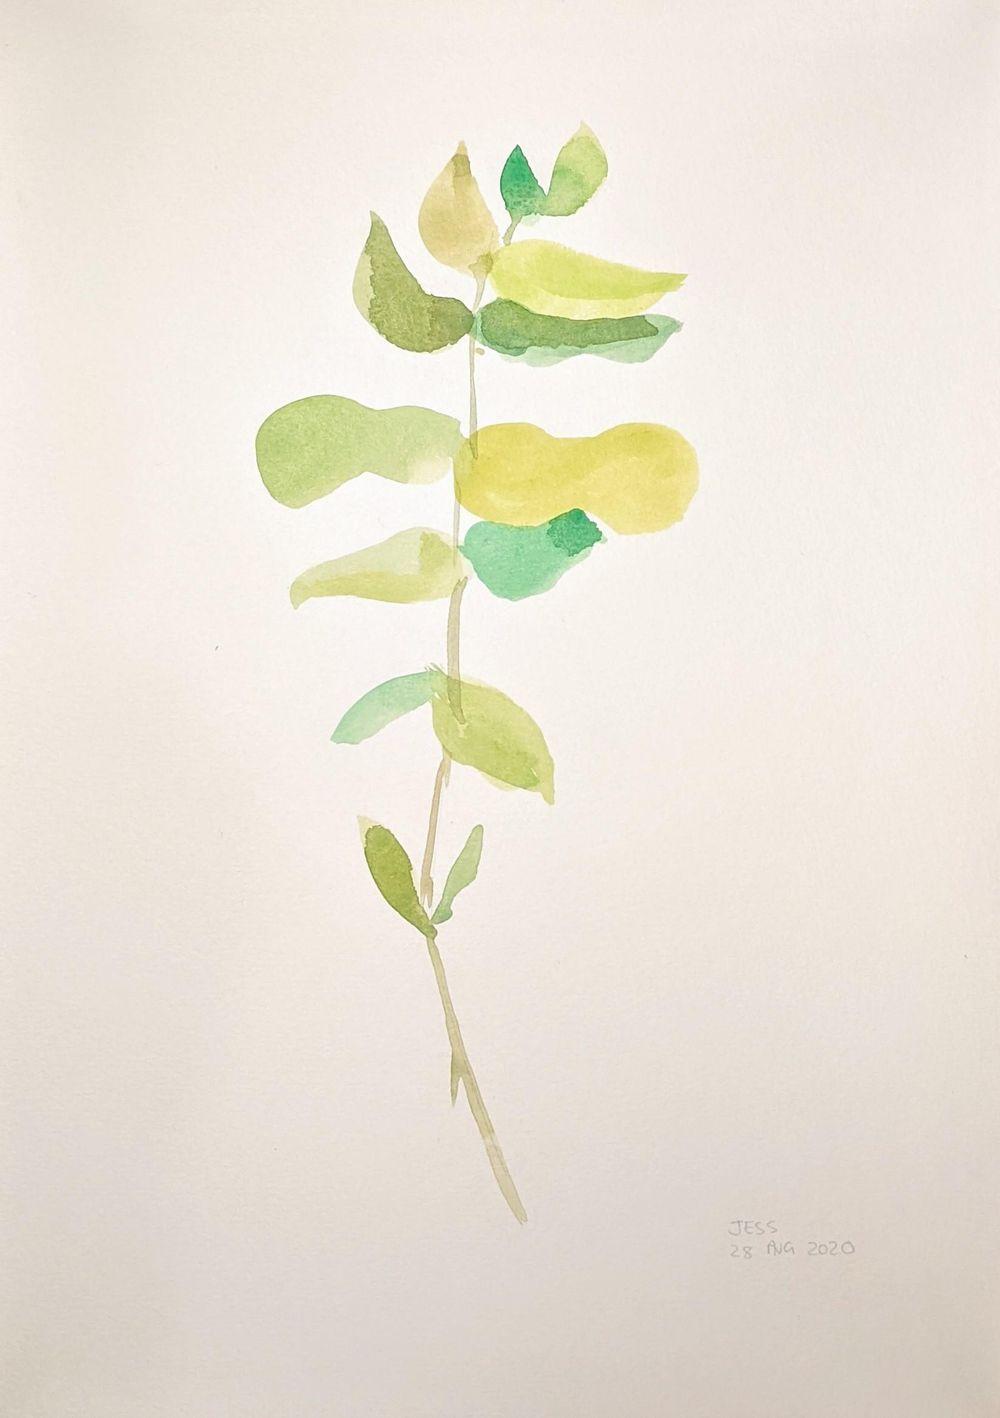 Eucalyptus watercolour - image 1 - student project